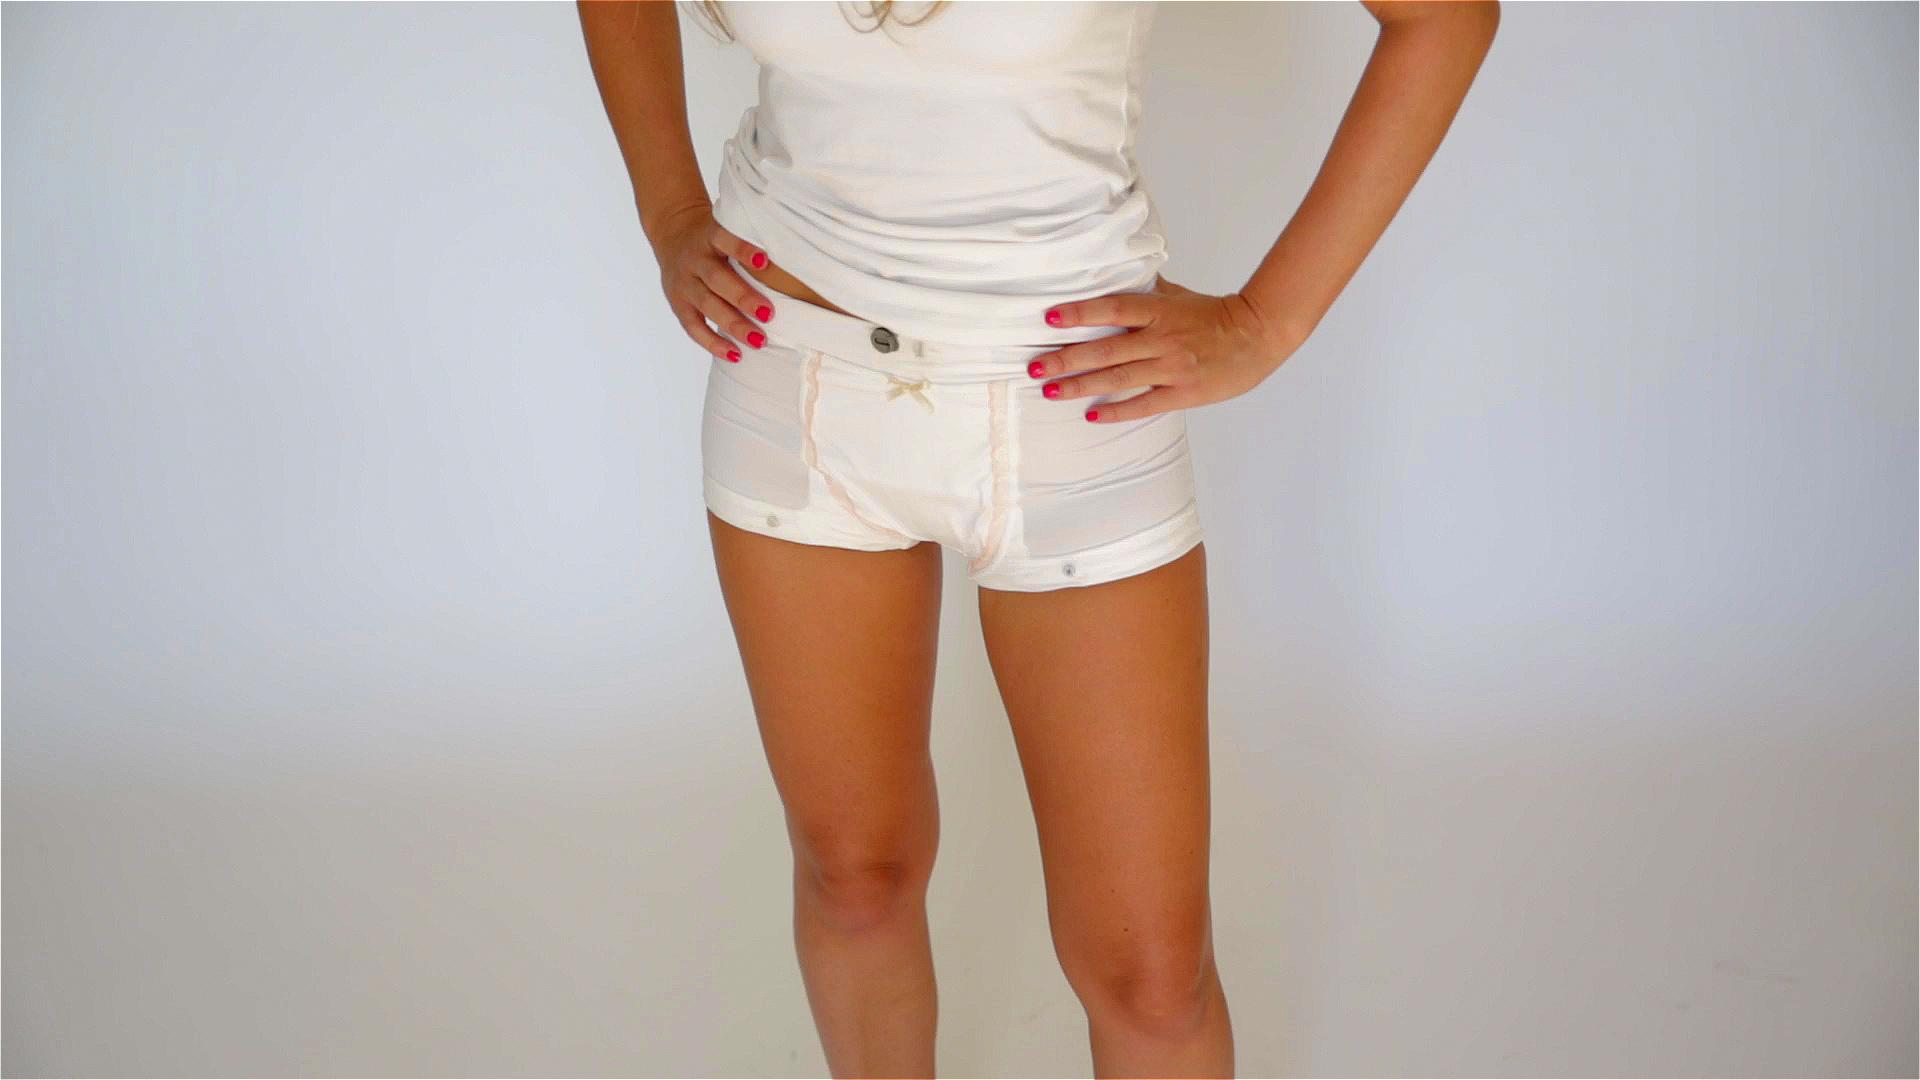 wearing chastity belt